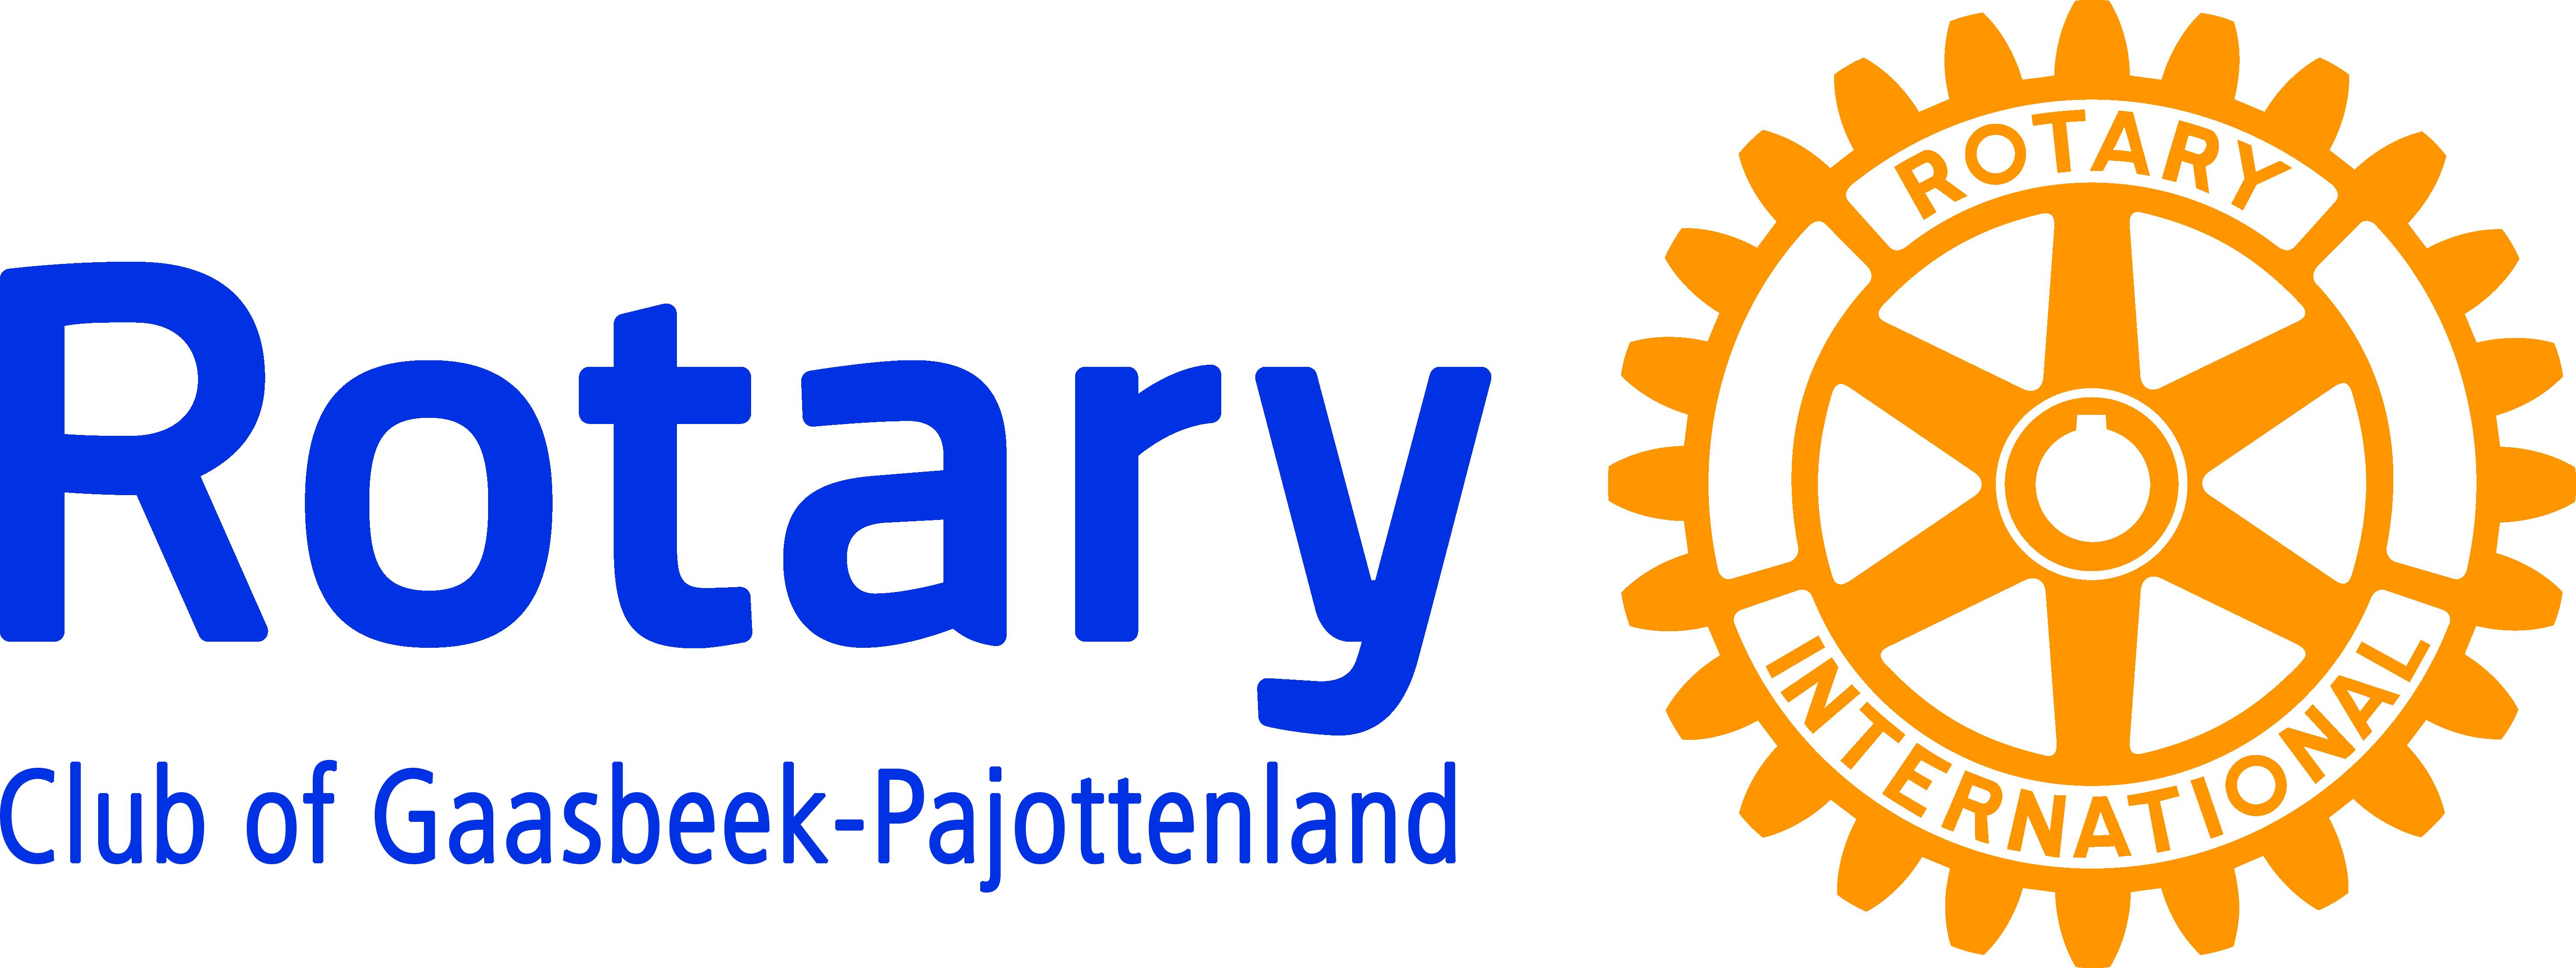 platina-rotary_gaasbeekpajottenland